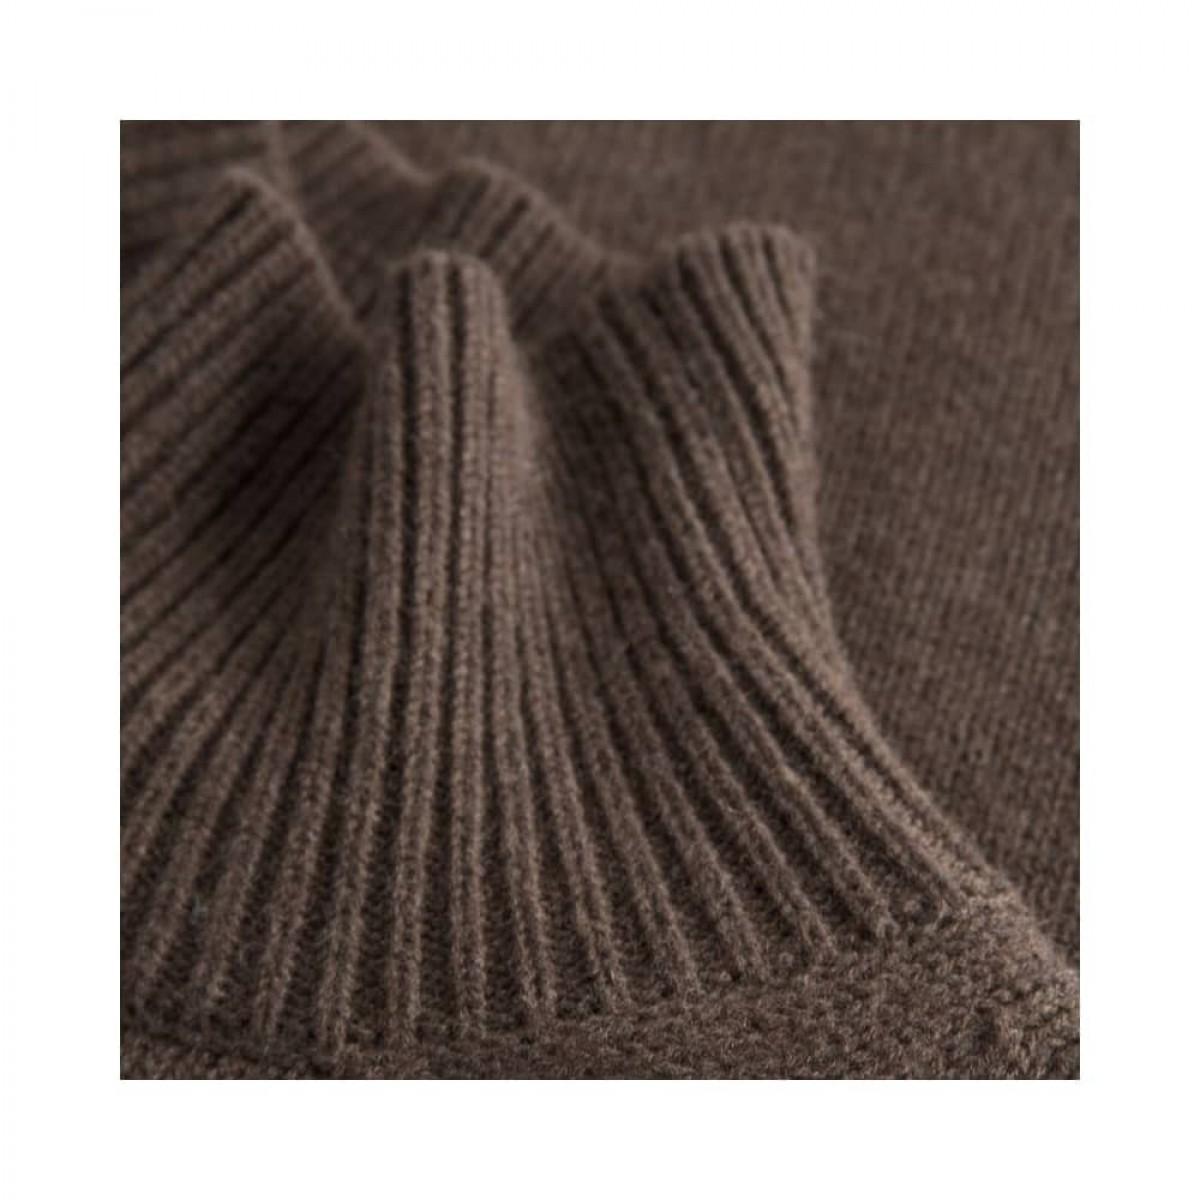 manny pullover - dark brown - krave